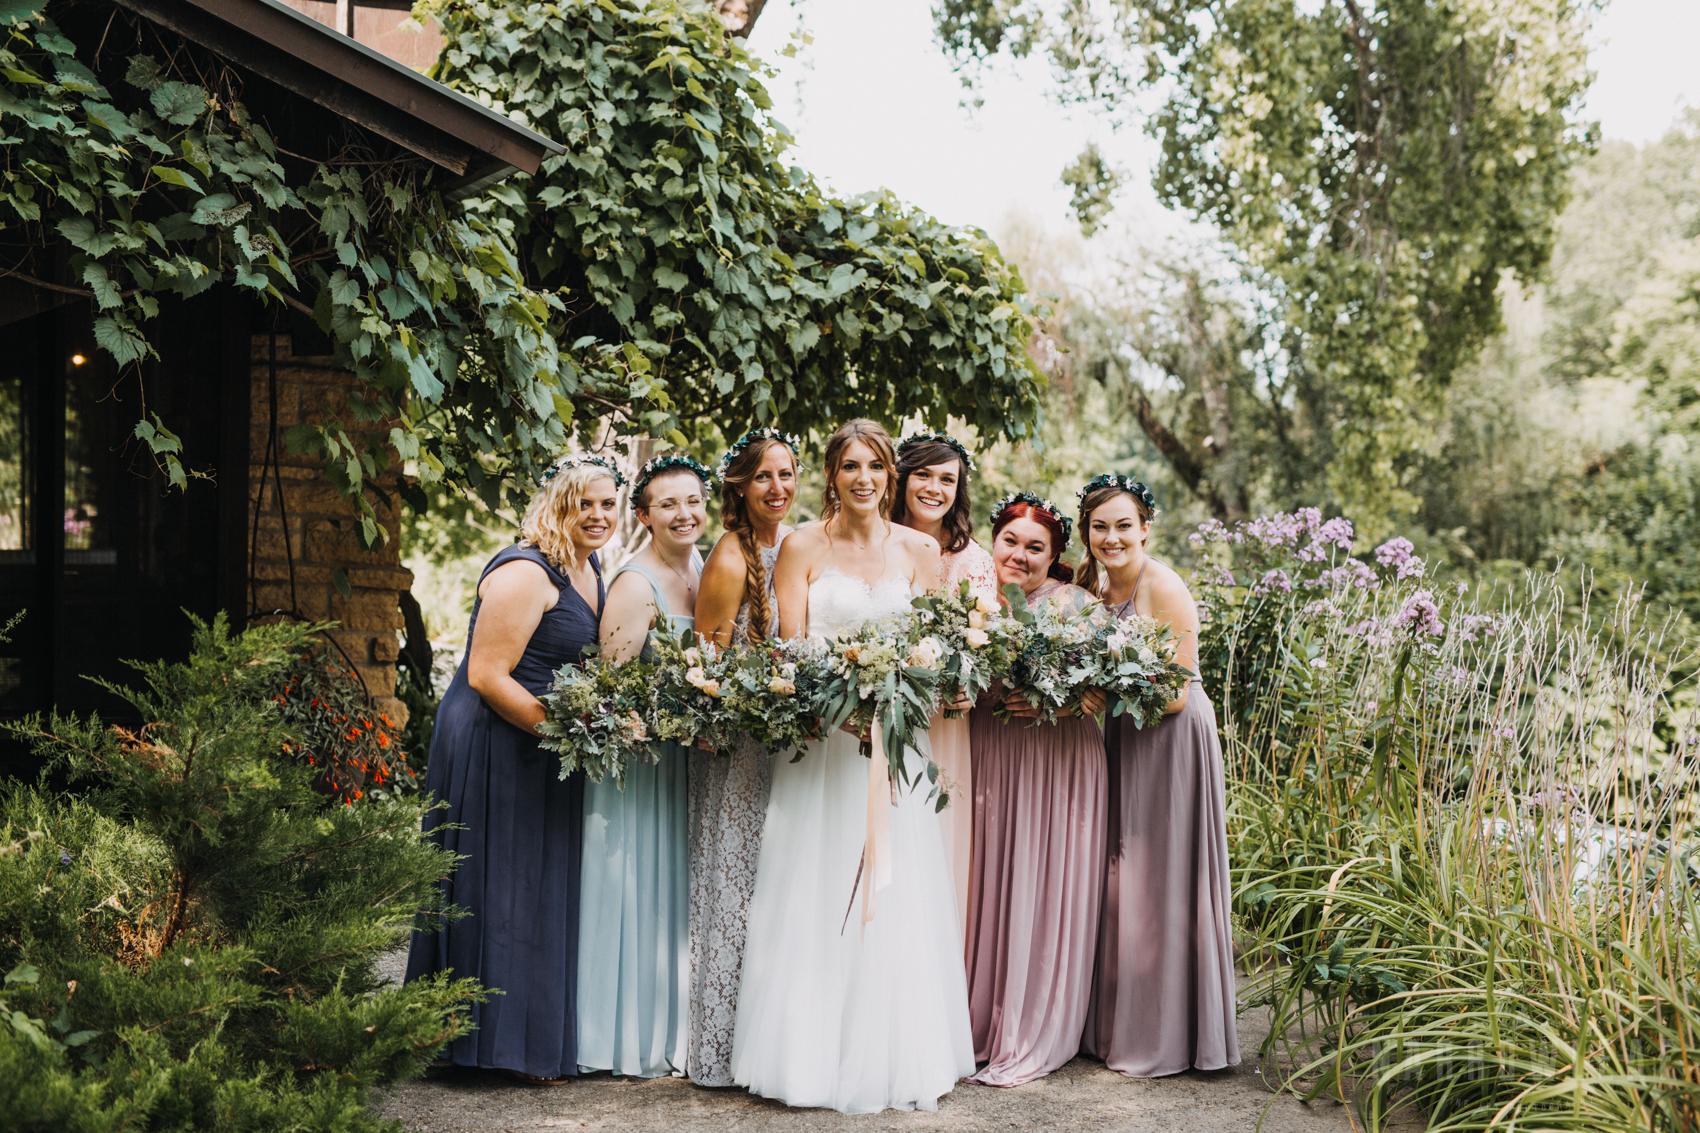 Dreamy garden wedding in wisconsin